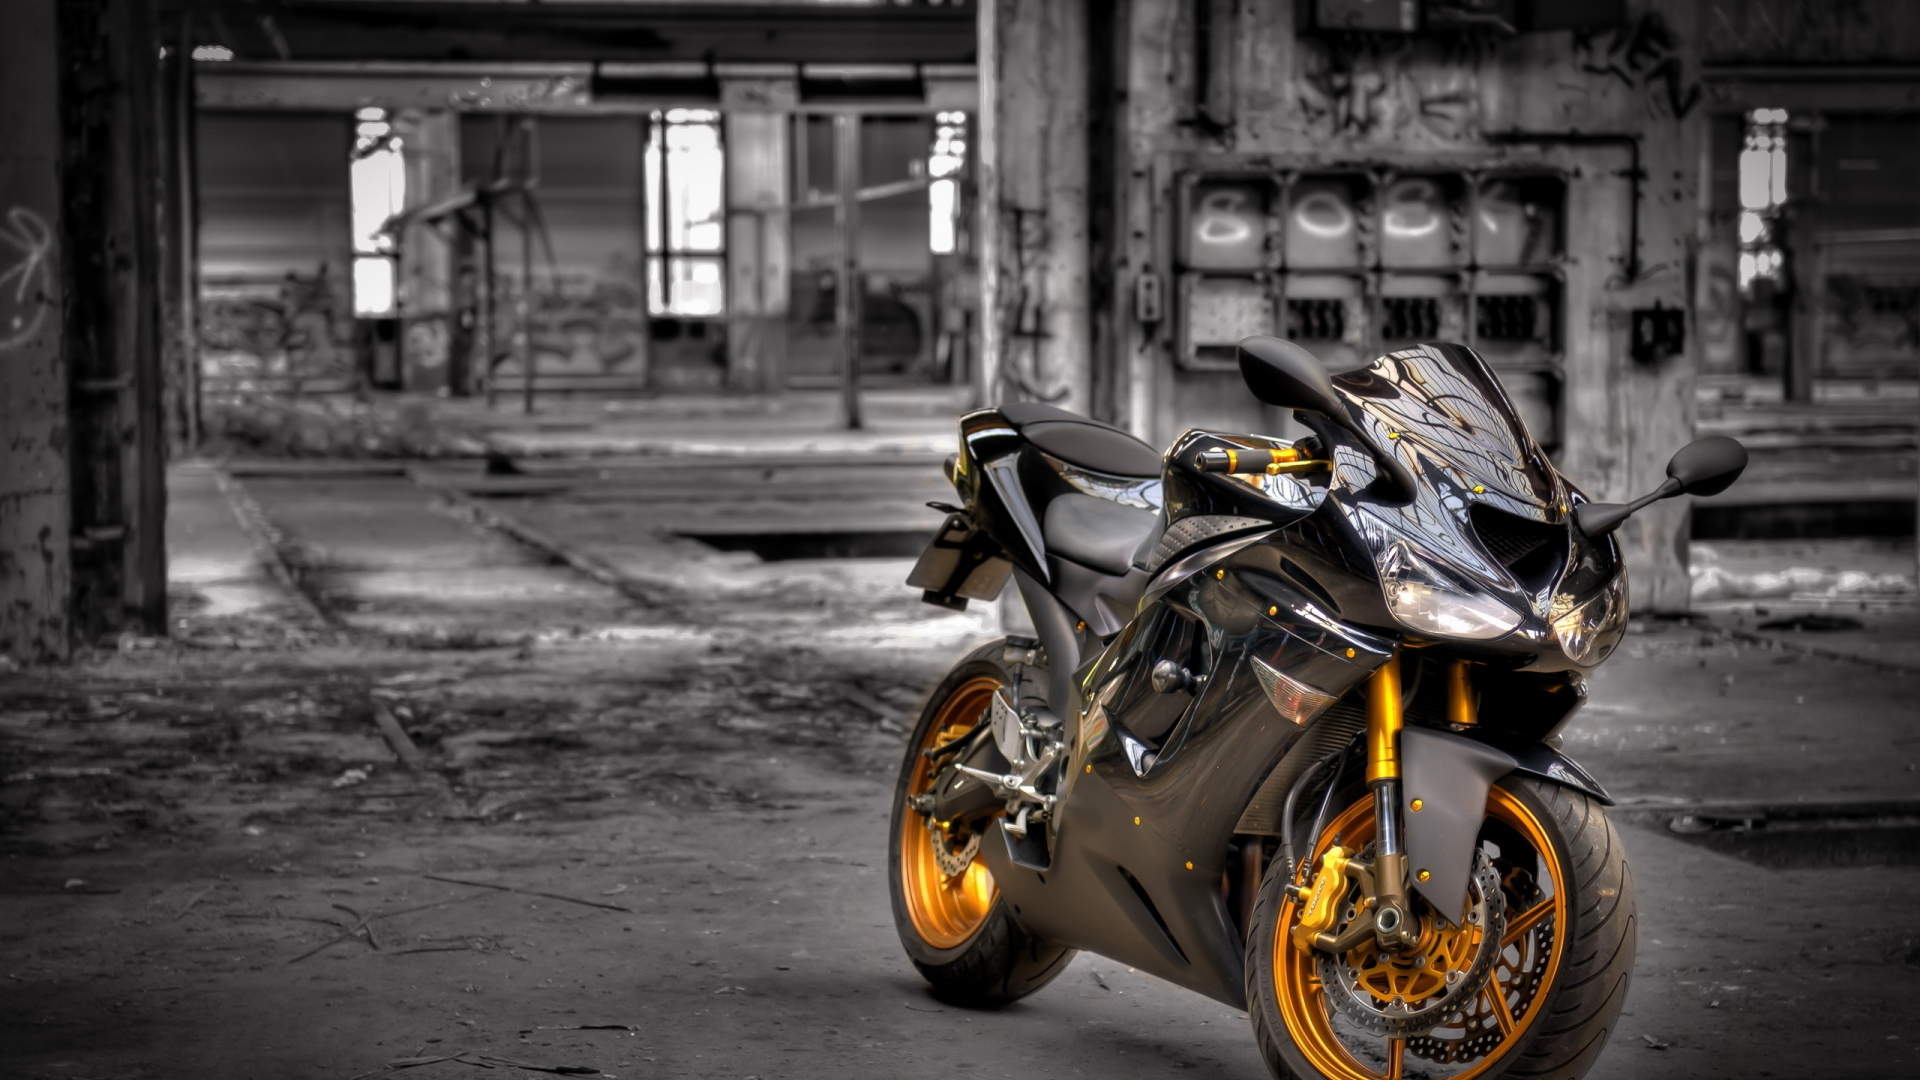 dirk bike hd wallpaper 1080p - photo #18